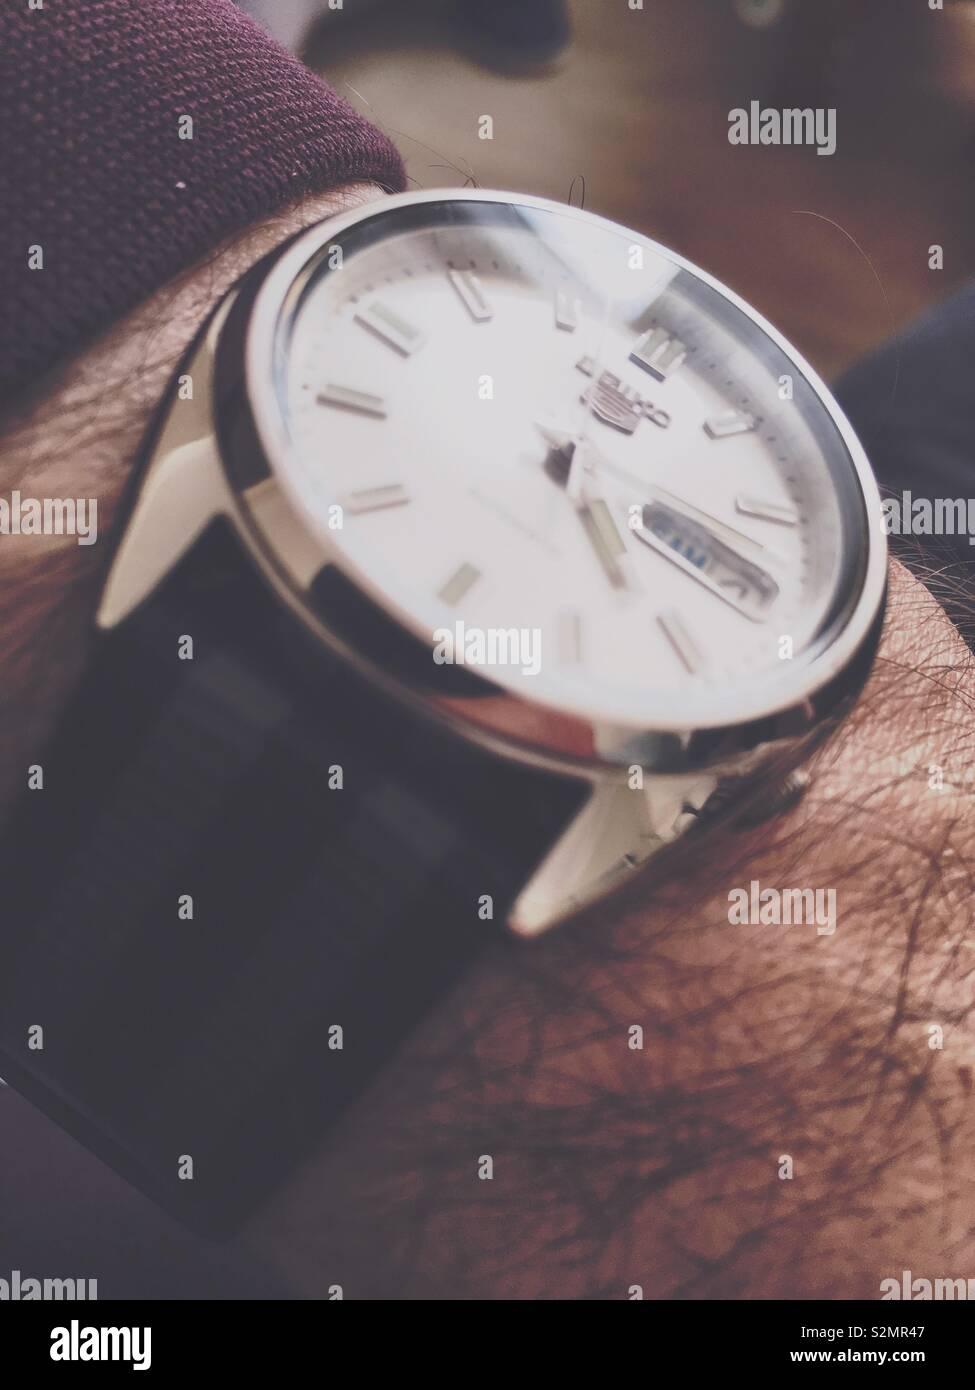 Retro looking wrist watch on a mans wrist - Stock Image